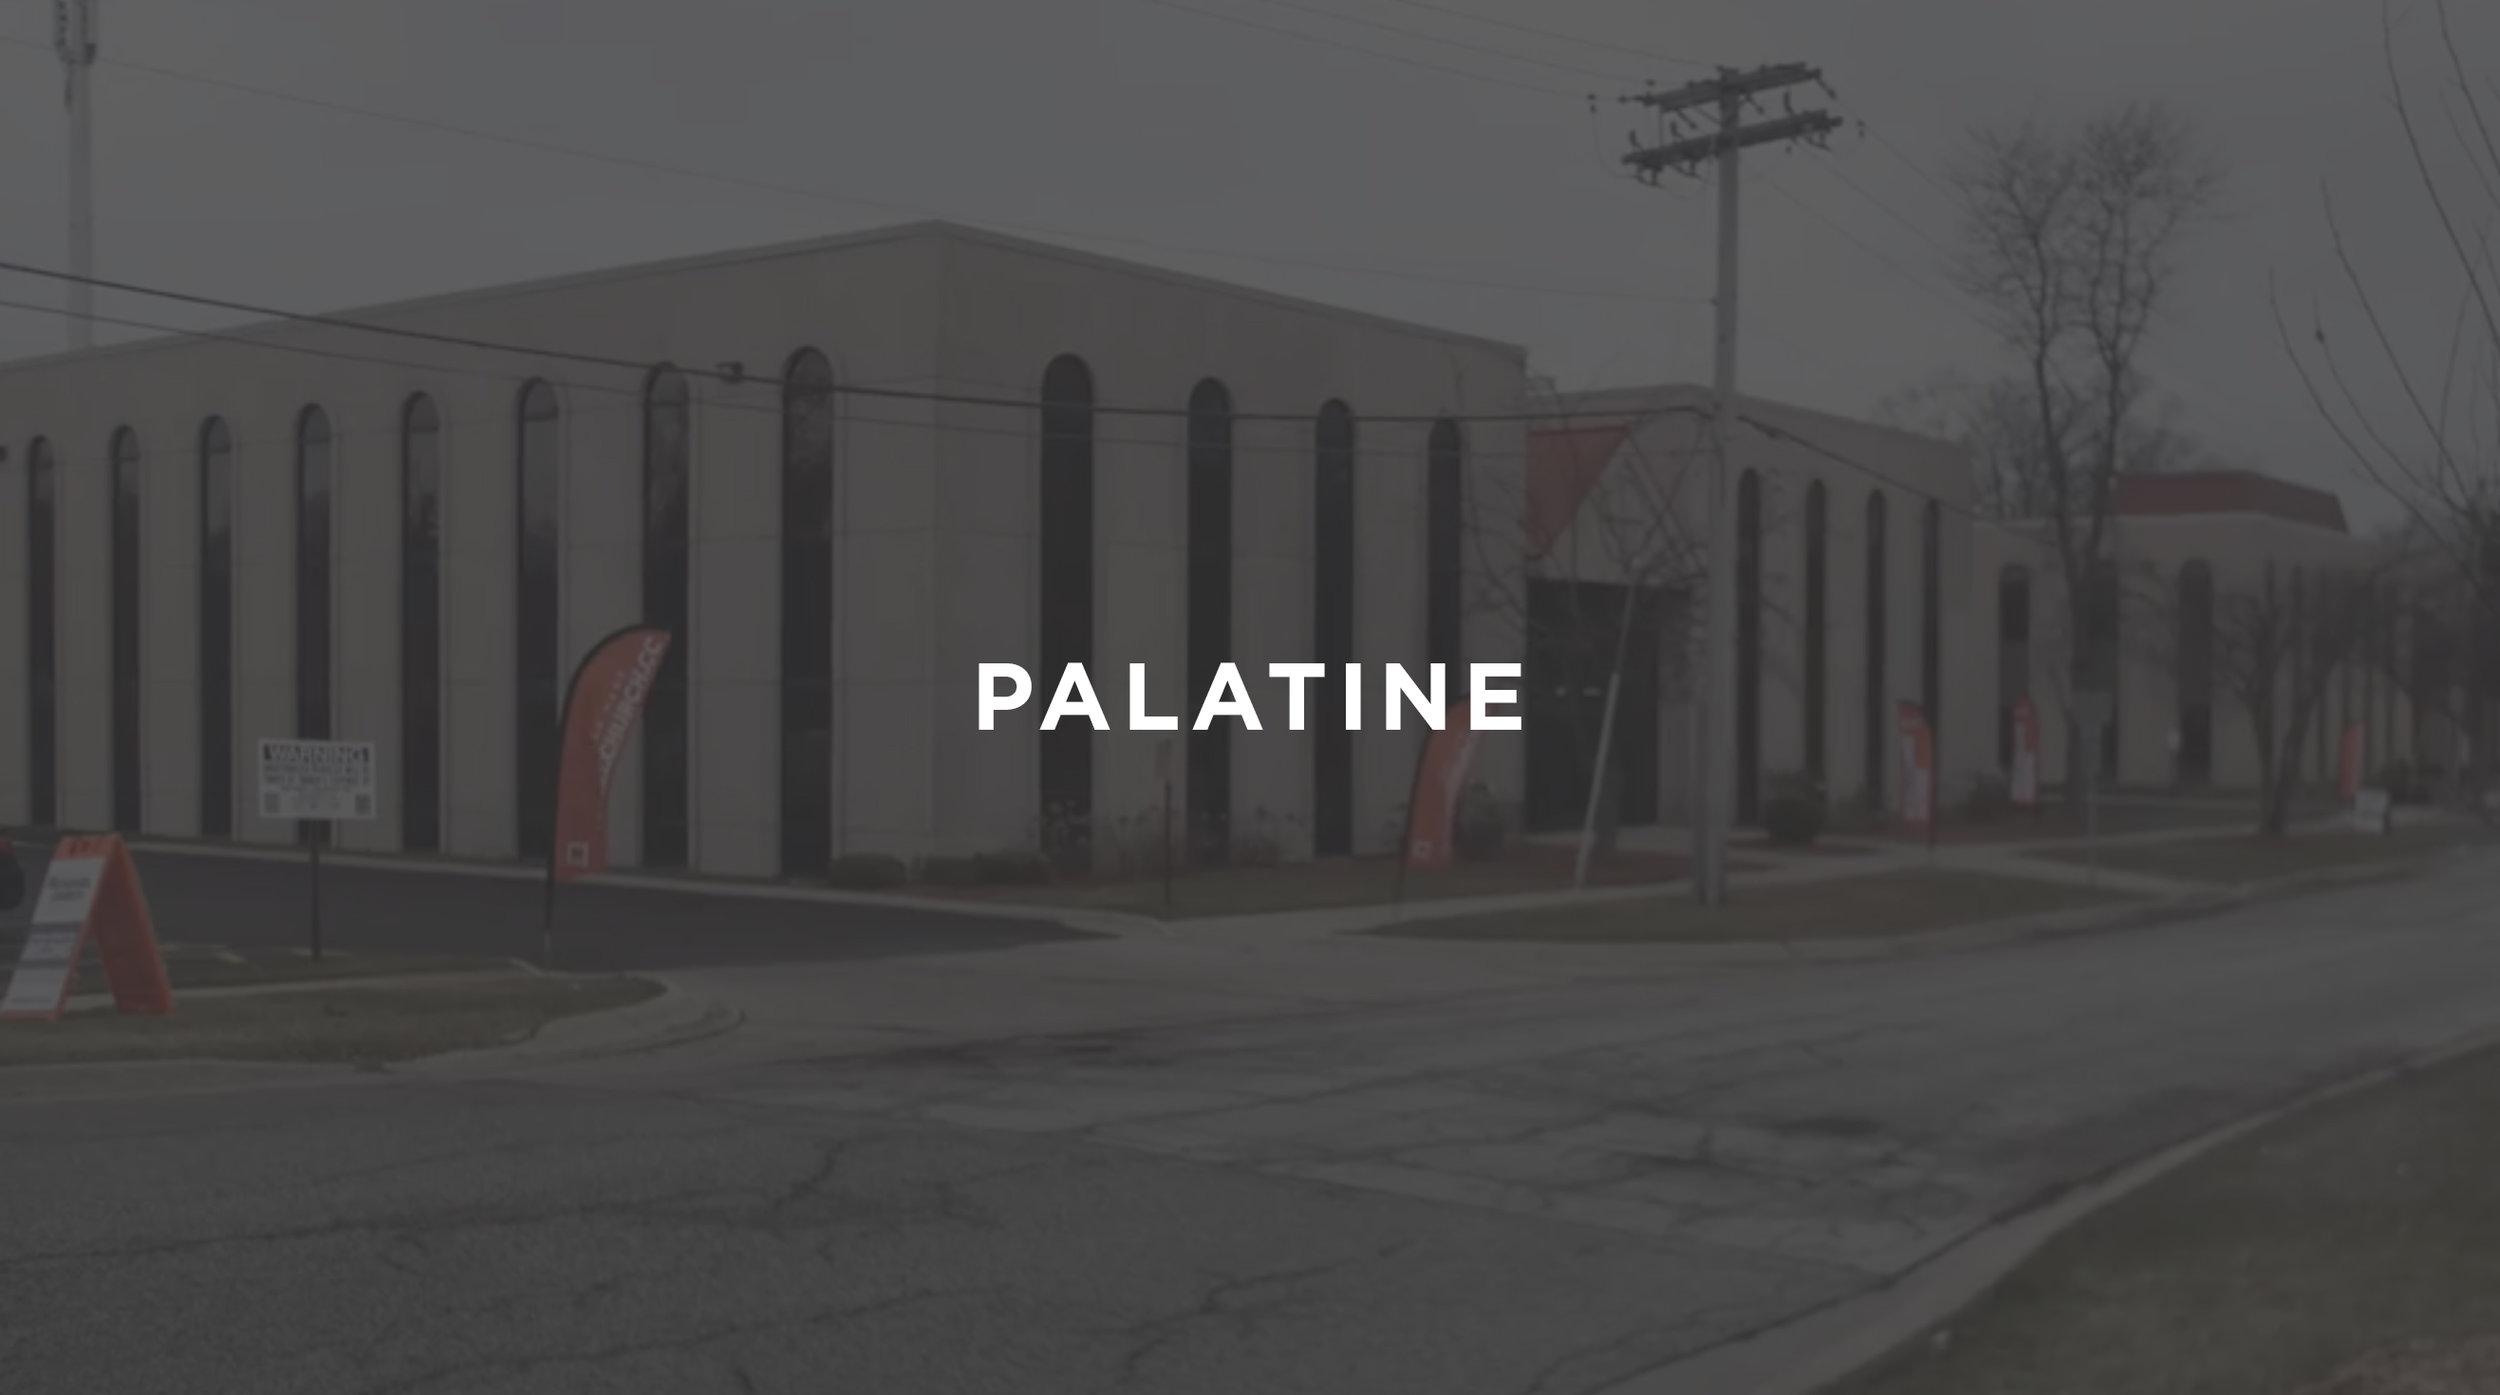 palatine location.jpg